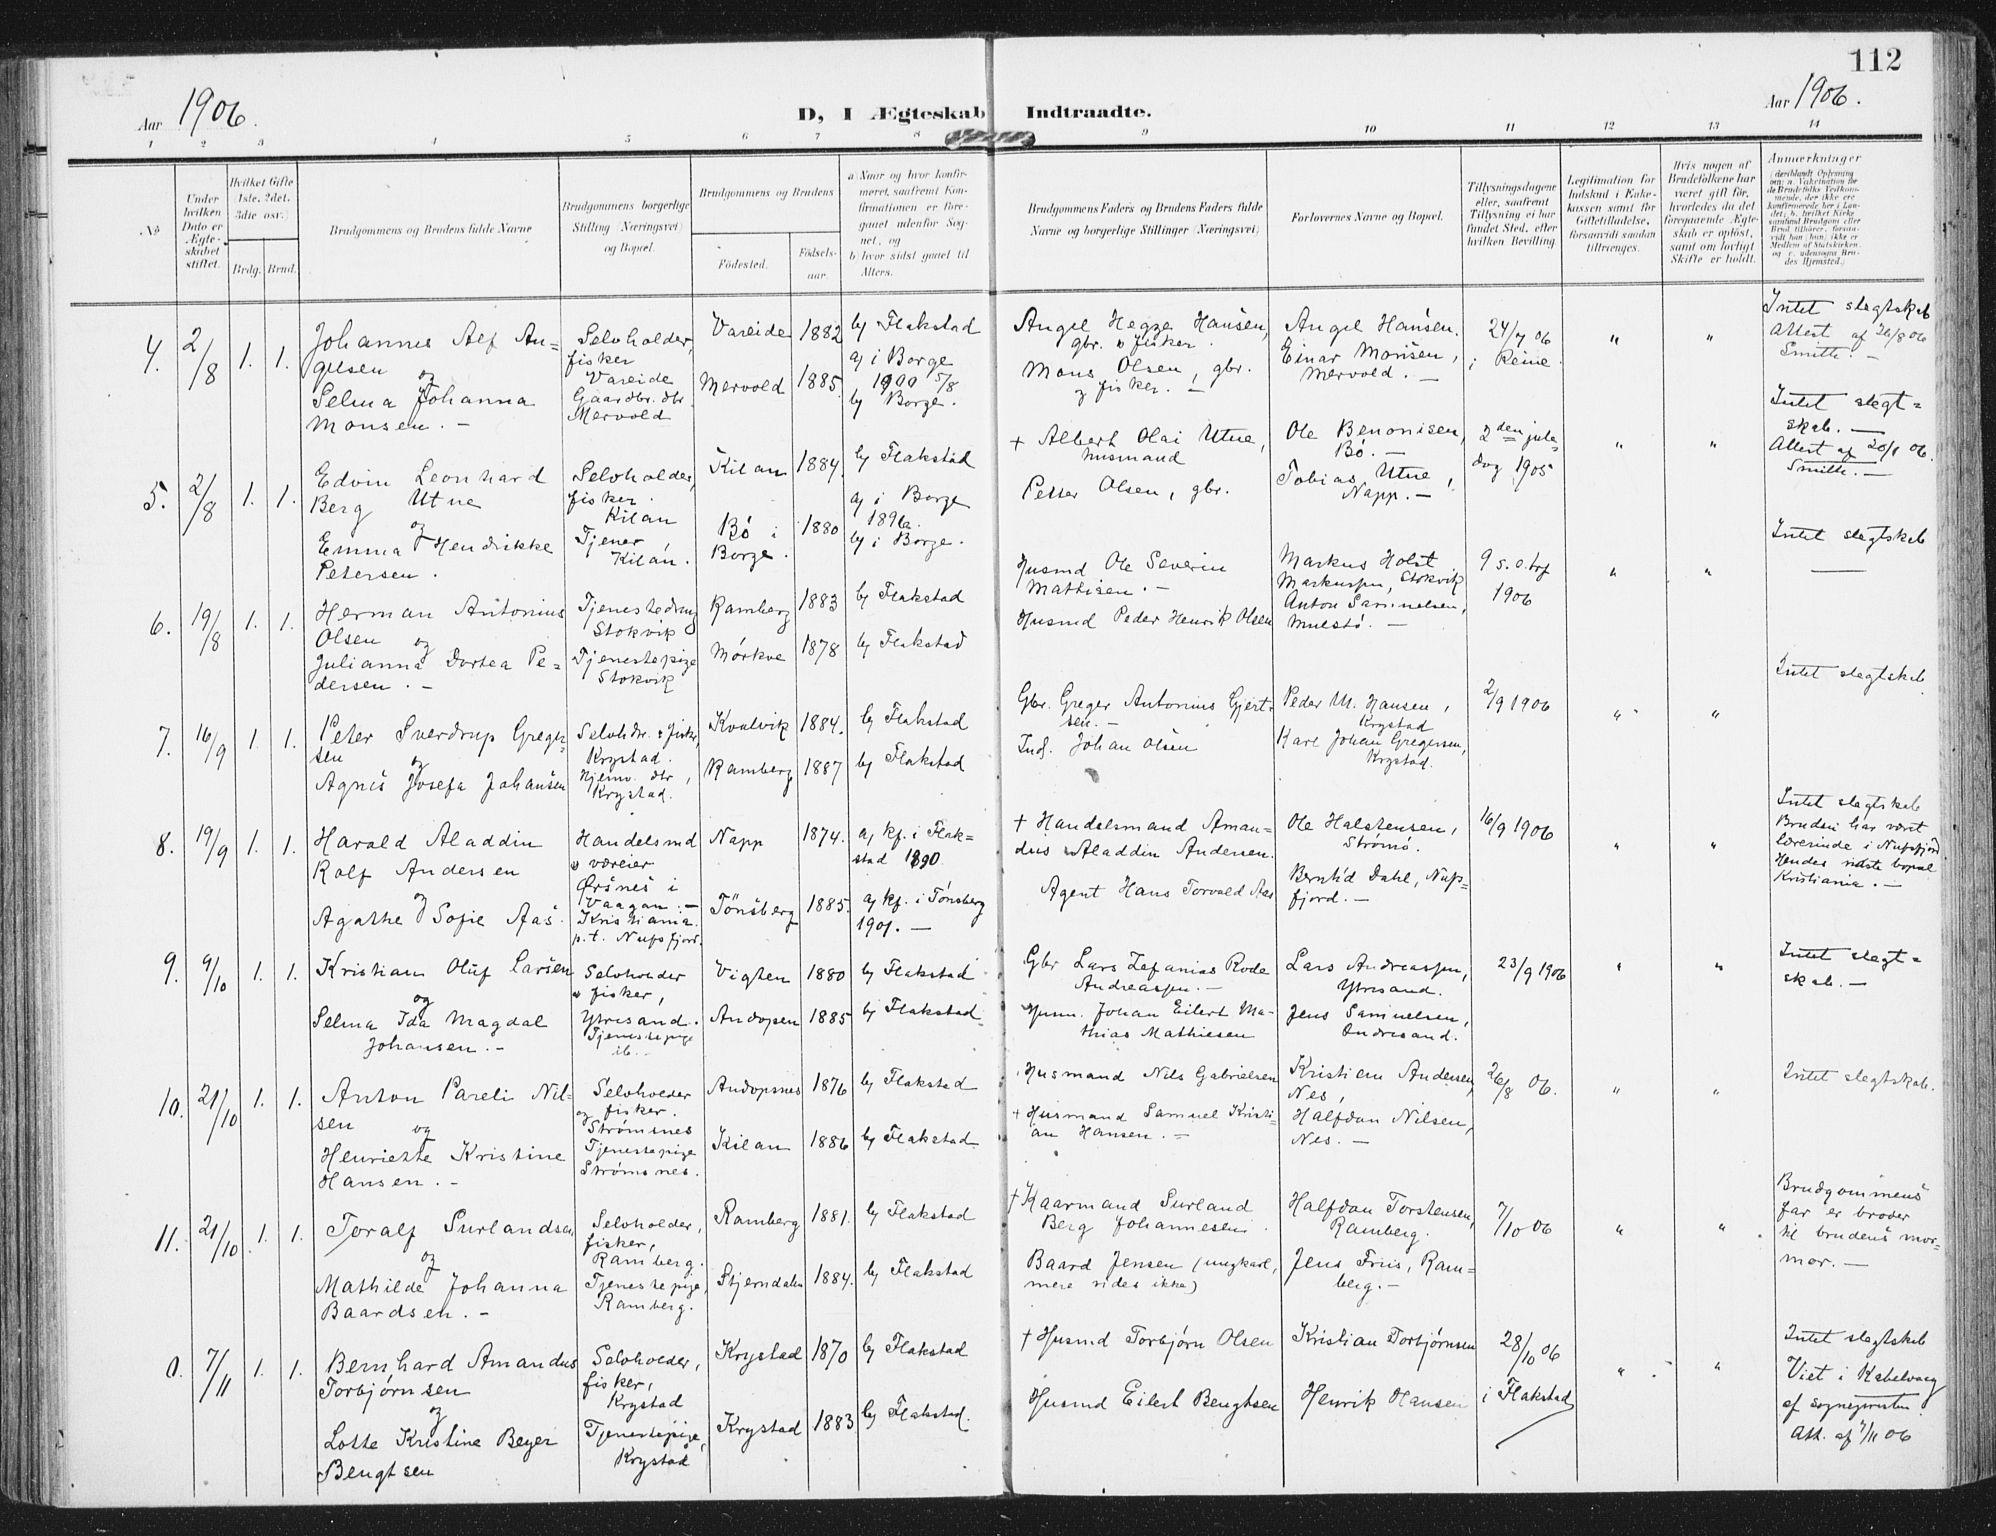 SAT, Ministerialprotokoller, klokkerbøker og fødselsregistre - Nordland, 885/L1206: Ministerialbok nr. 885A07, 1905-1915, s. 112